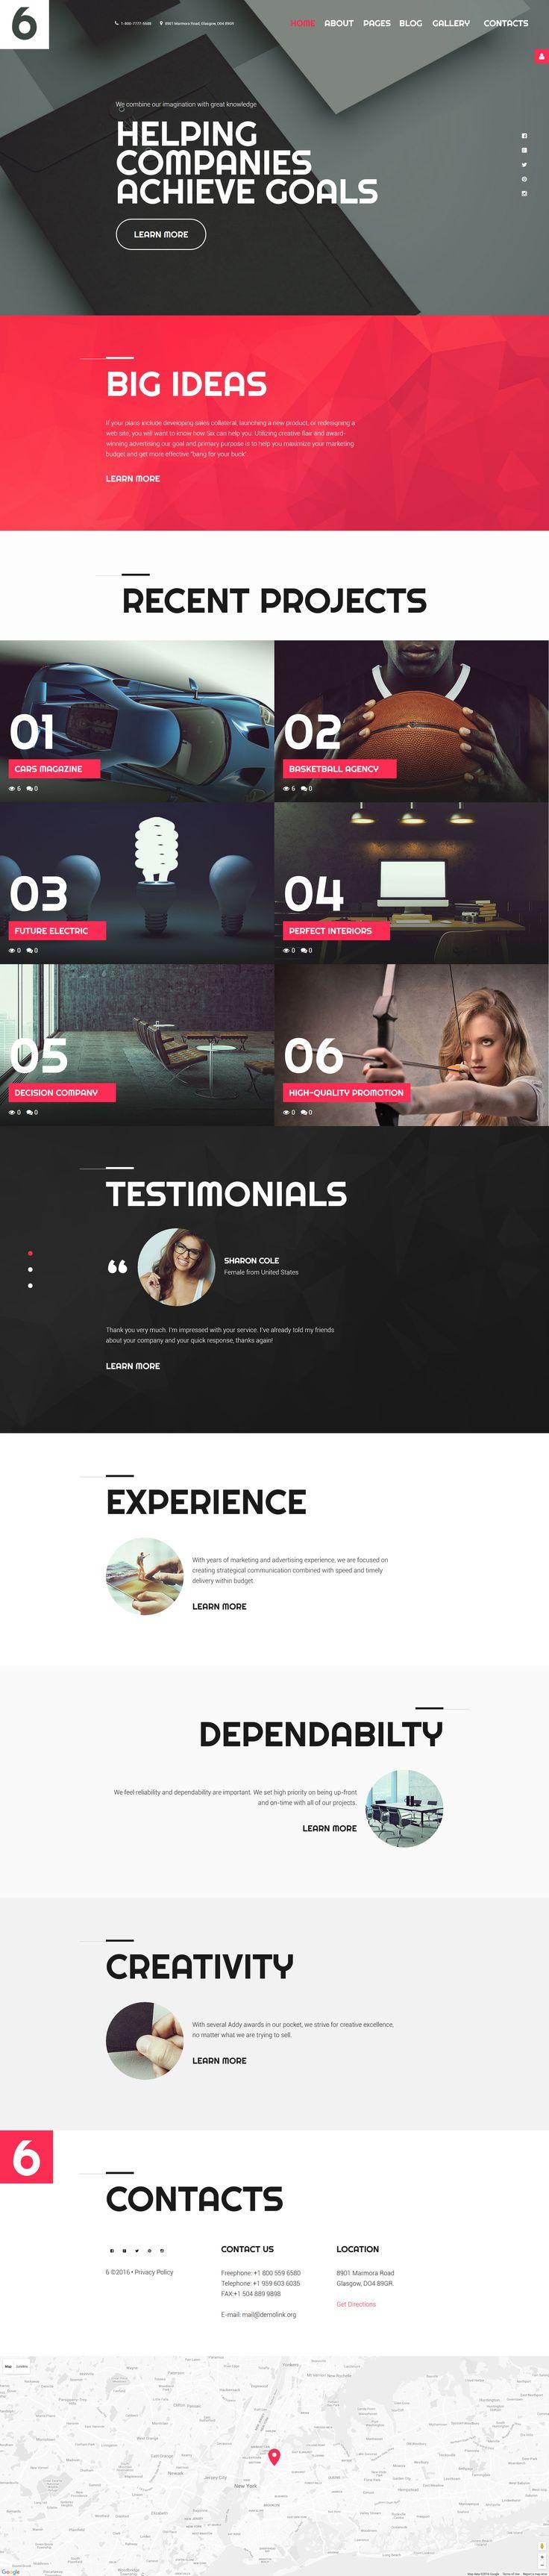 Advertising Agency Joomla Template http://www.templatemonster.com/joomla-templates/advertising-agency-joomla-template-58032.html